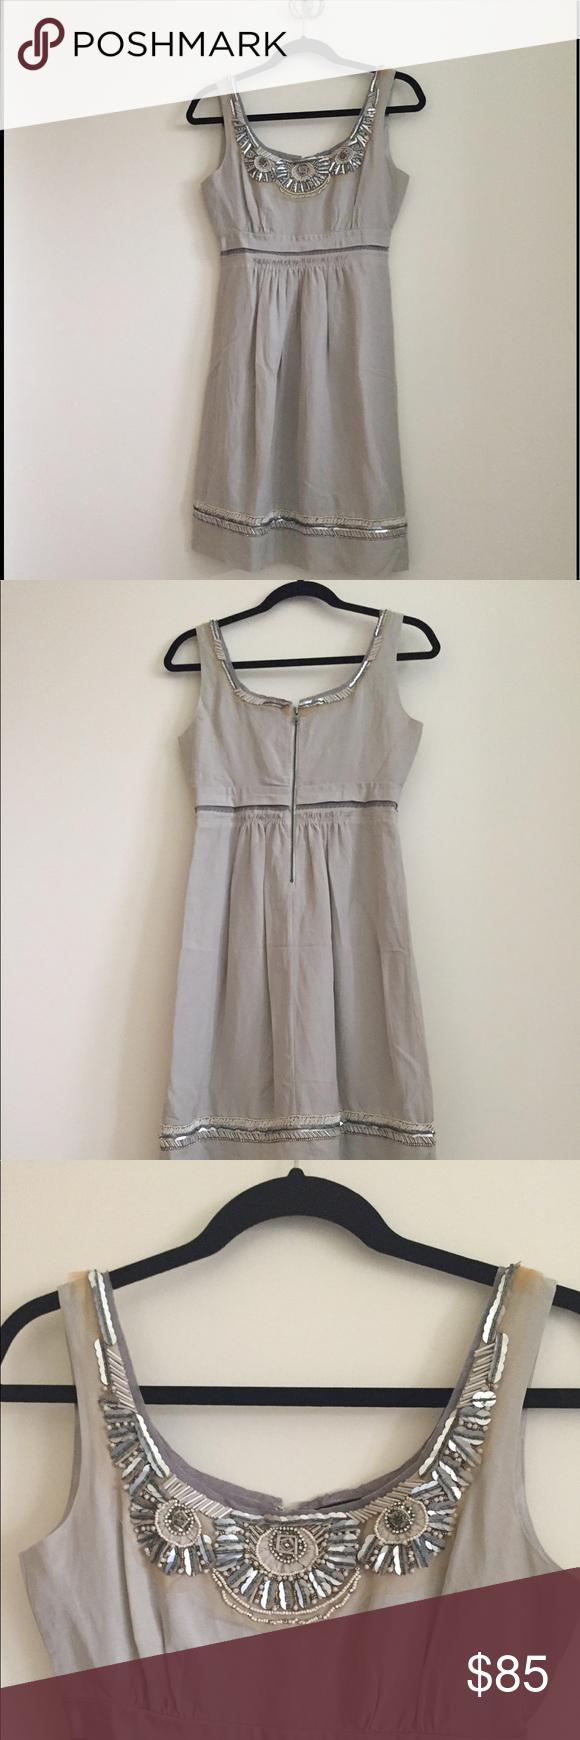 Elie Tahari Cocktail Dress Elie Tahari Dresses Clothes Design Tahari Dress [ 1740 x 580 Pixel ]